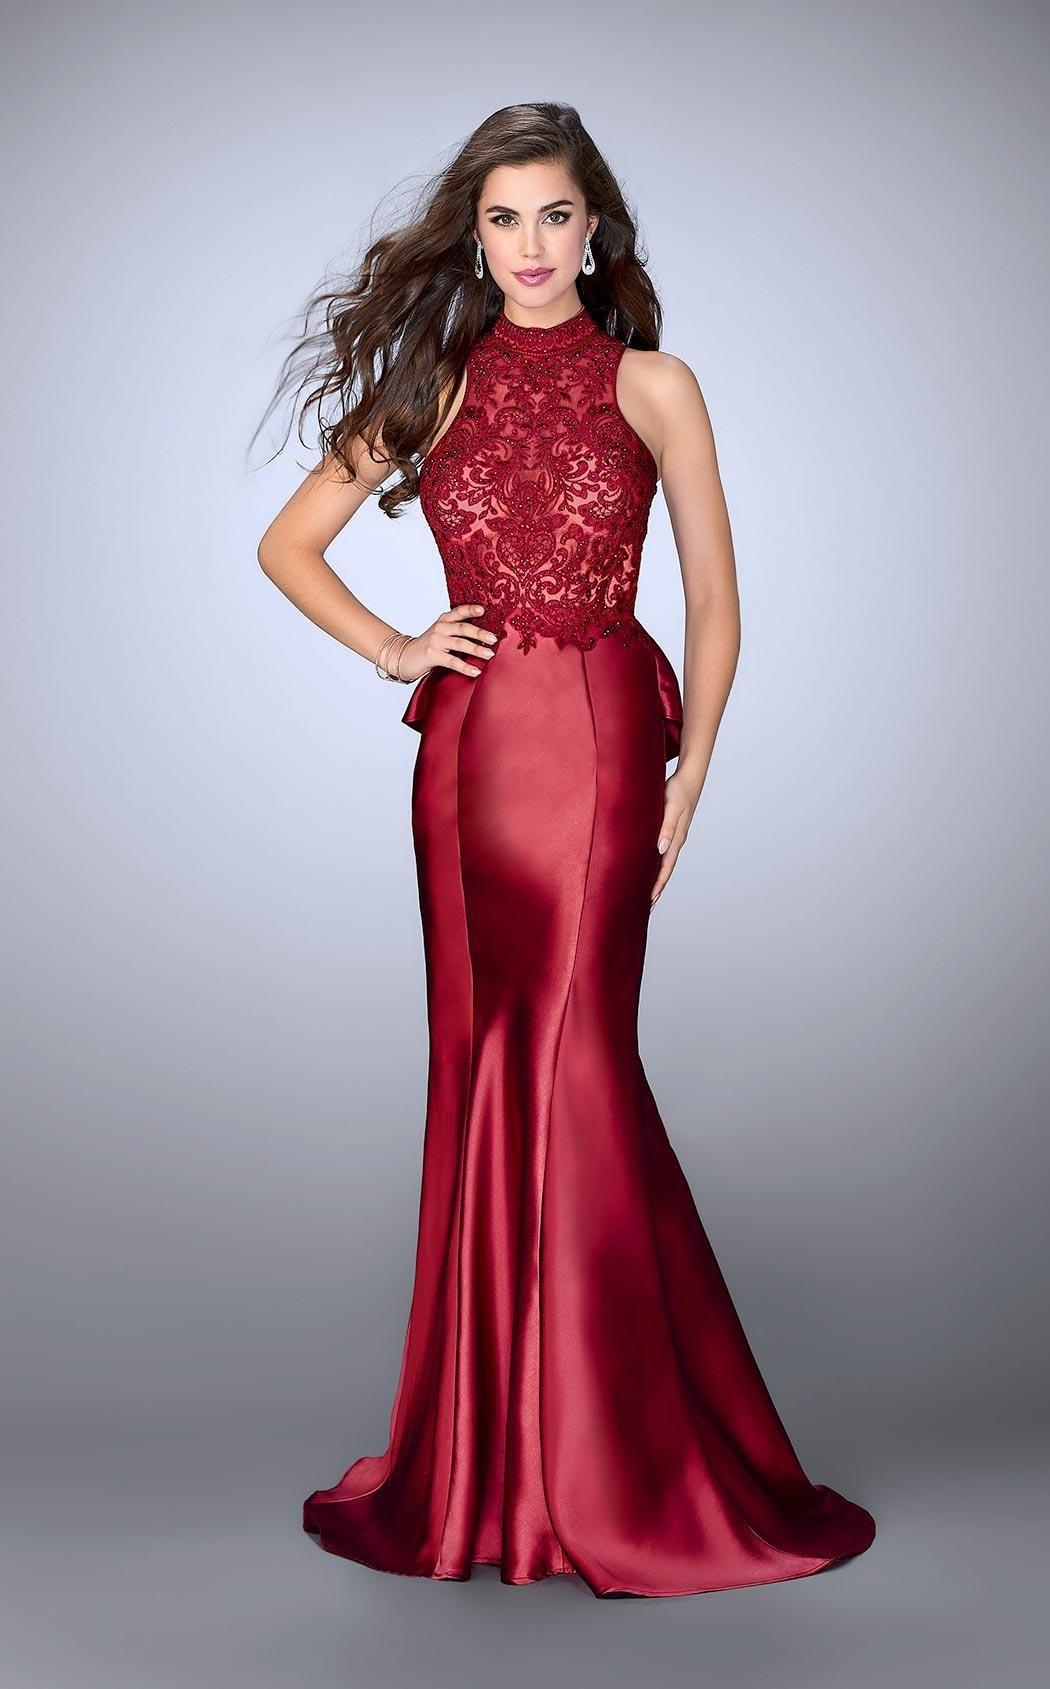 Atemberaubend Best Mermaid Prom Dresses Galerie - Brautkleider Ideen ...